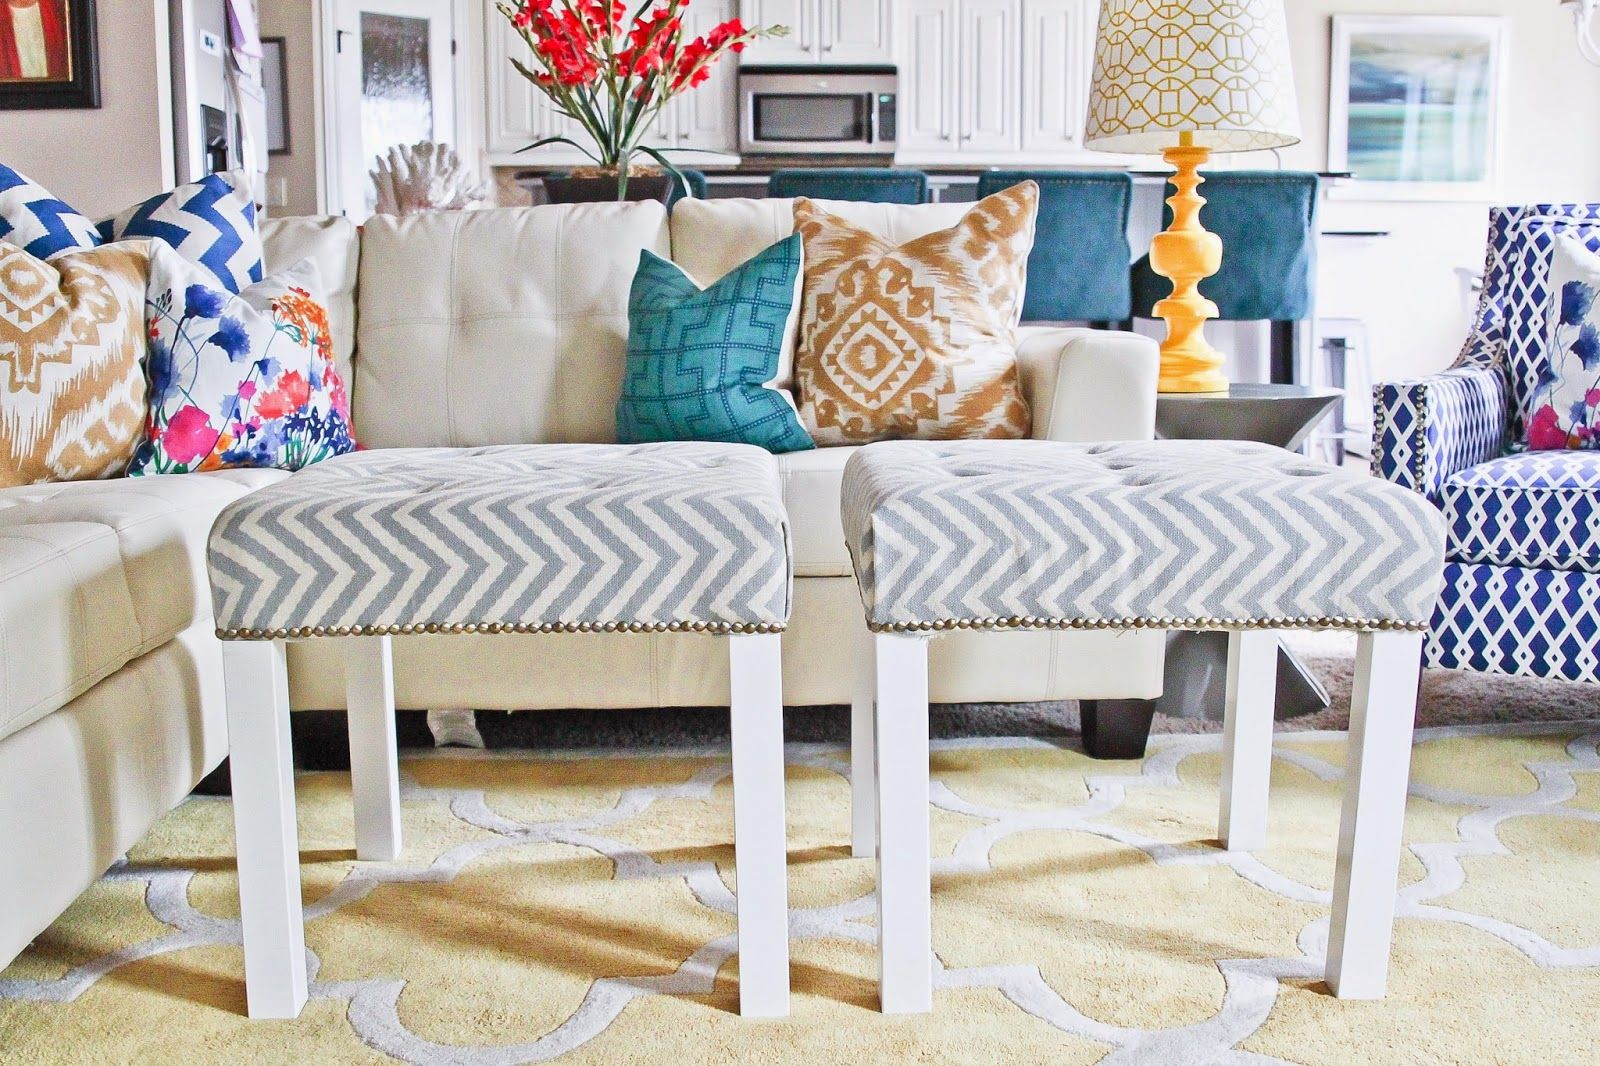 From Bargain to Beautiful: 29 Stylish IKEA Lack Table Hacks ...